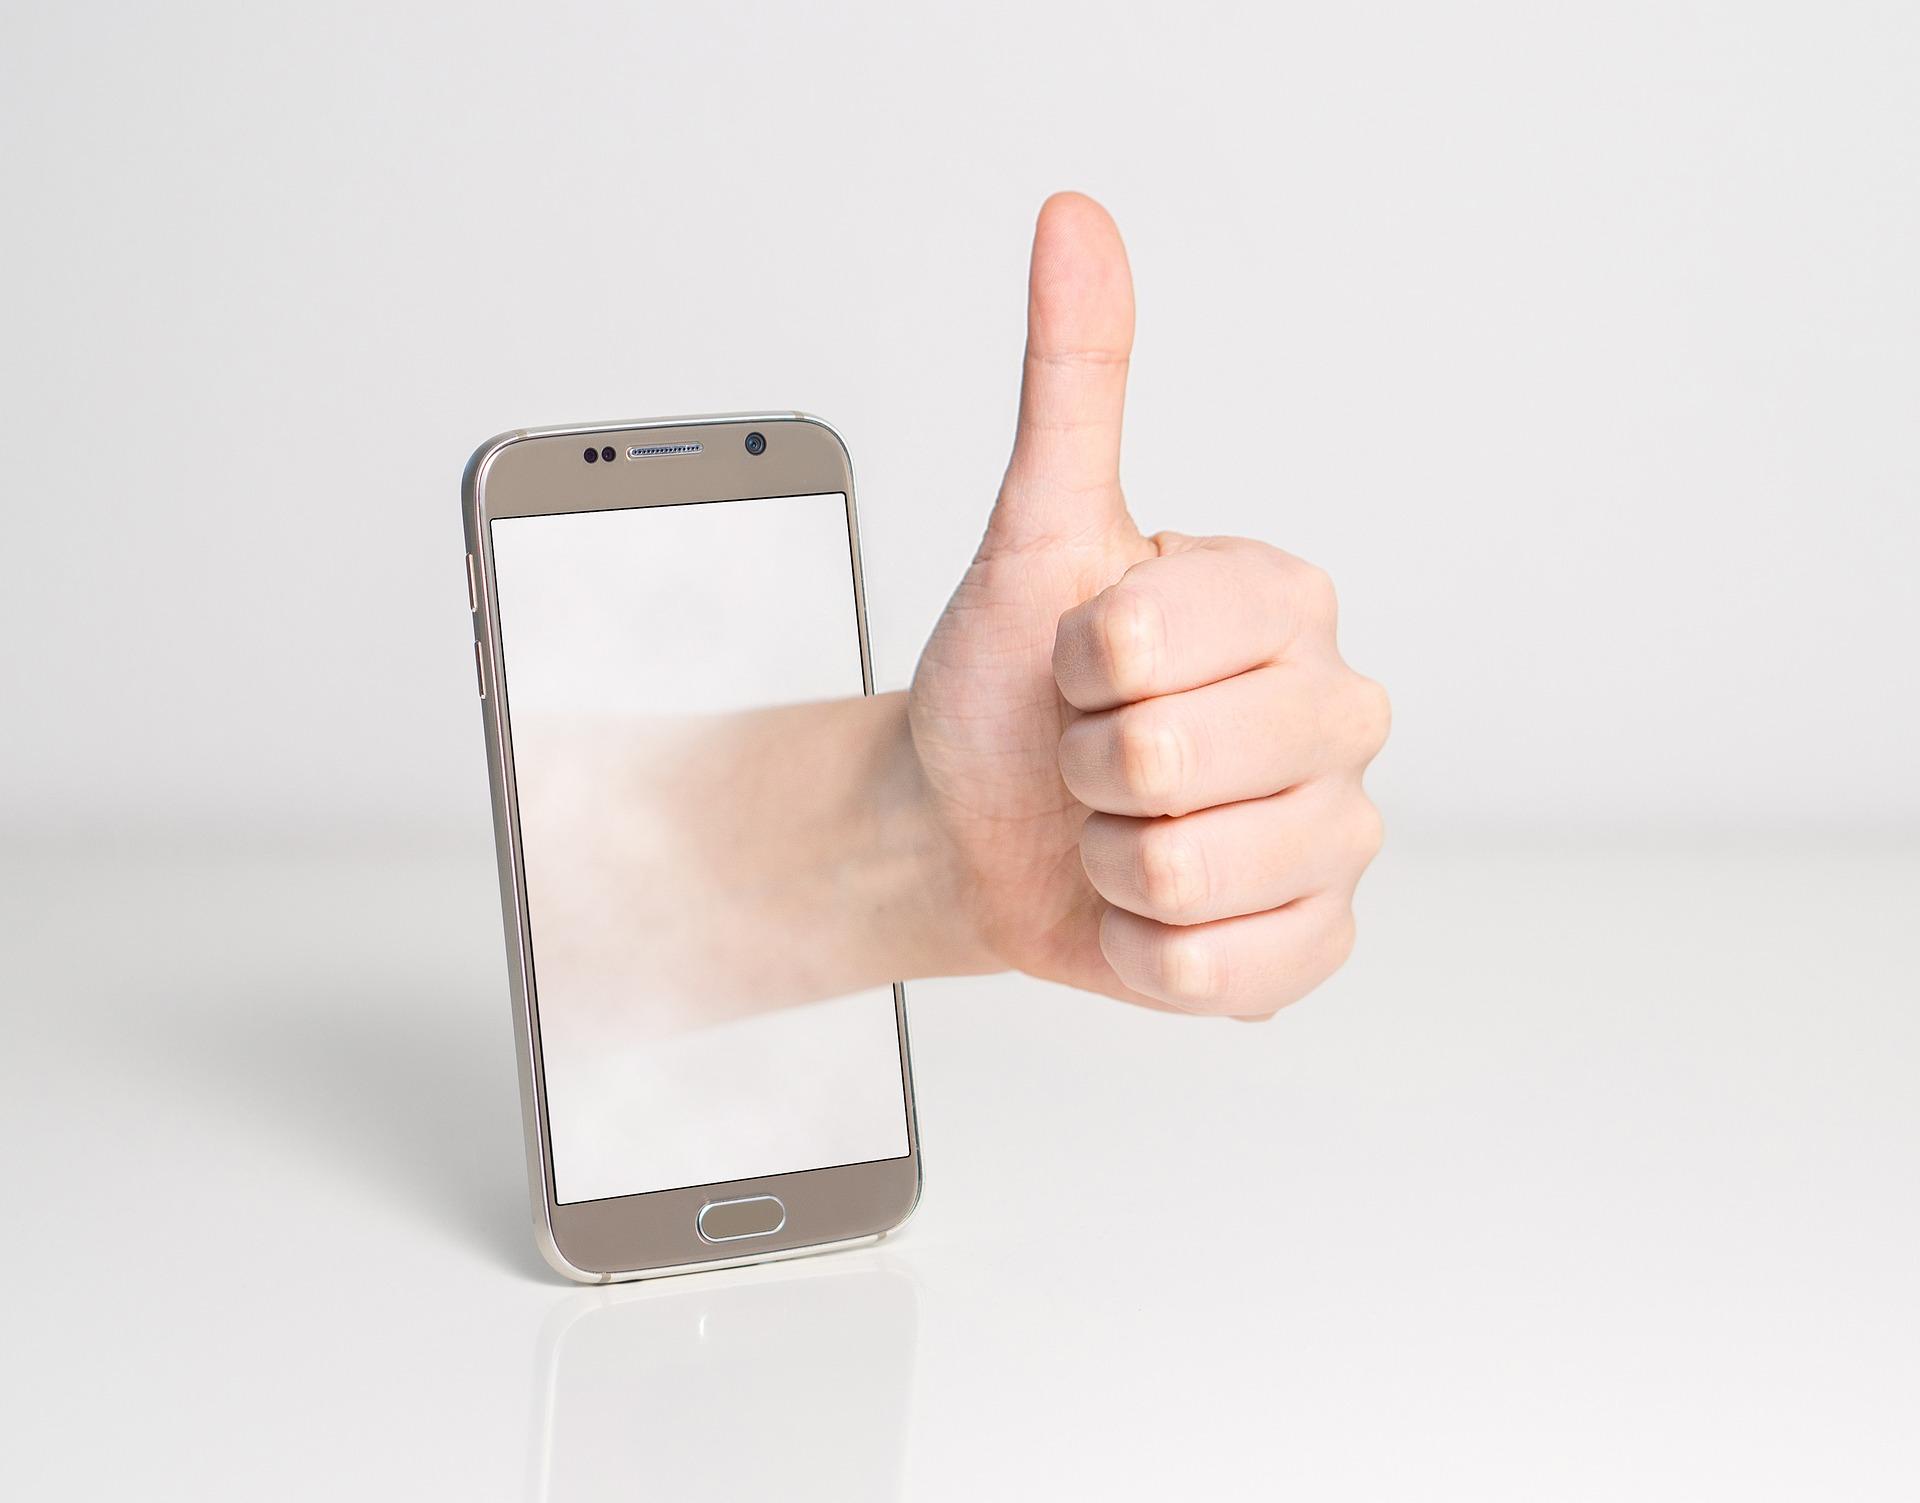 thumbs-up-1999780_1920.jpg